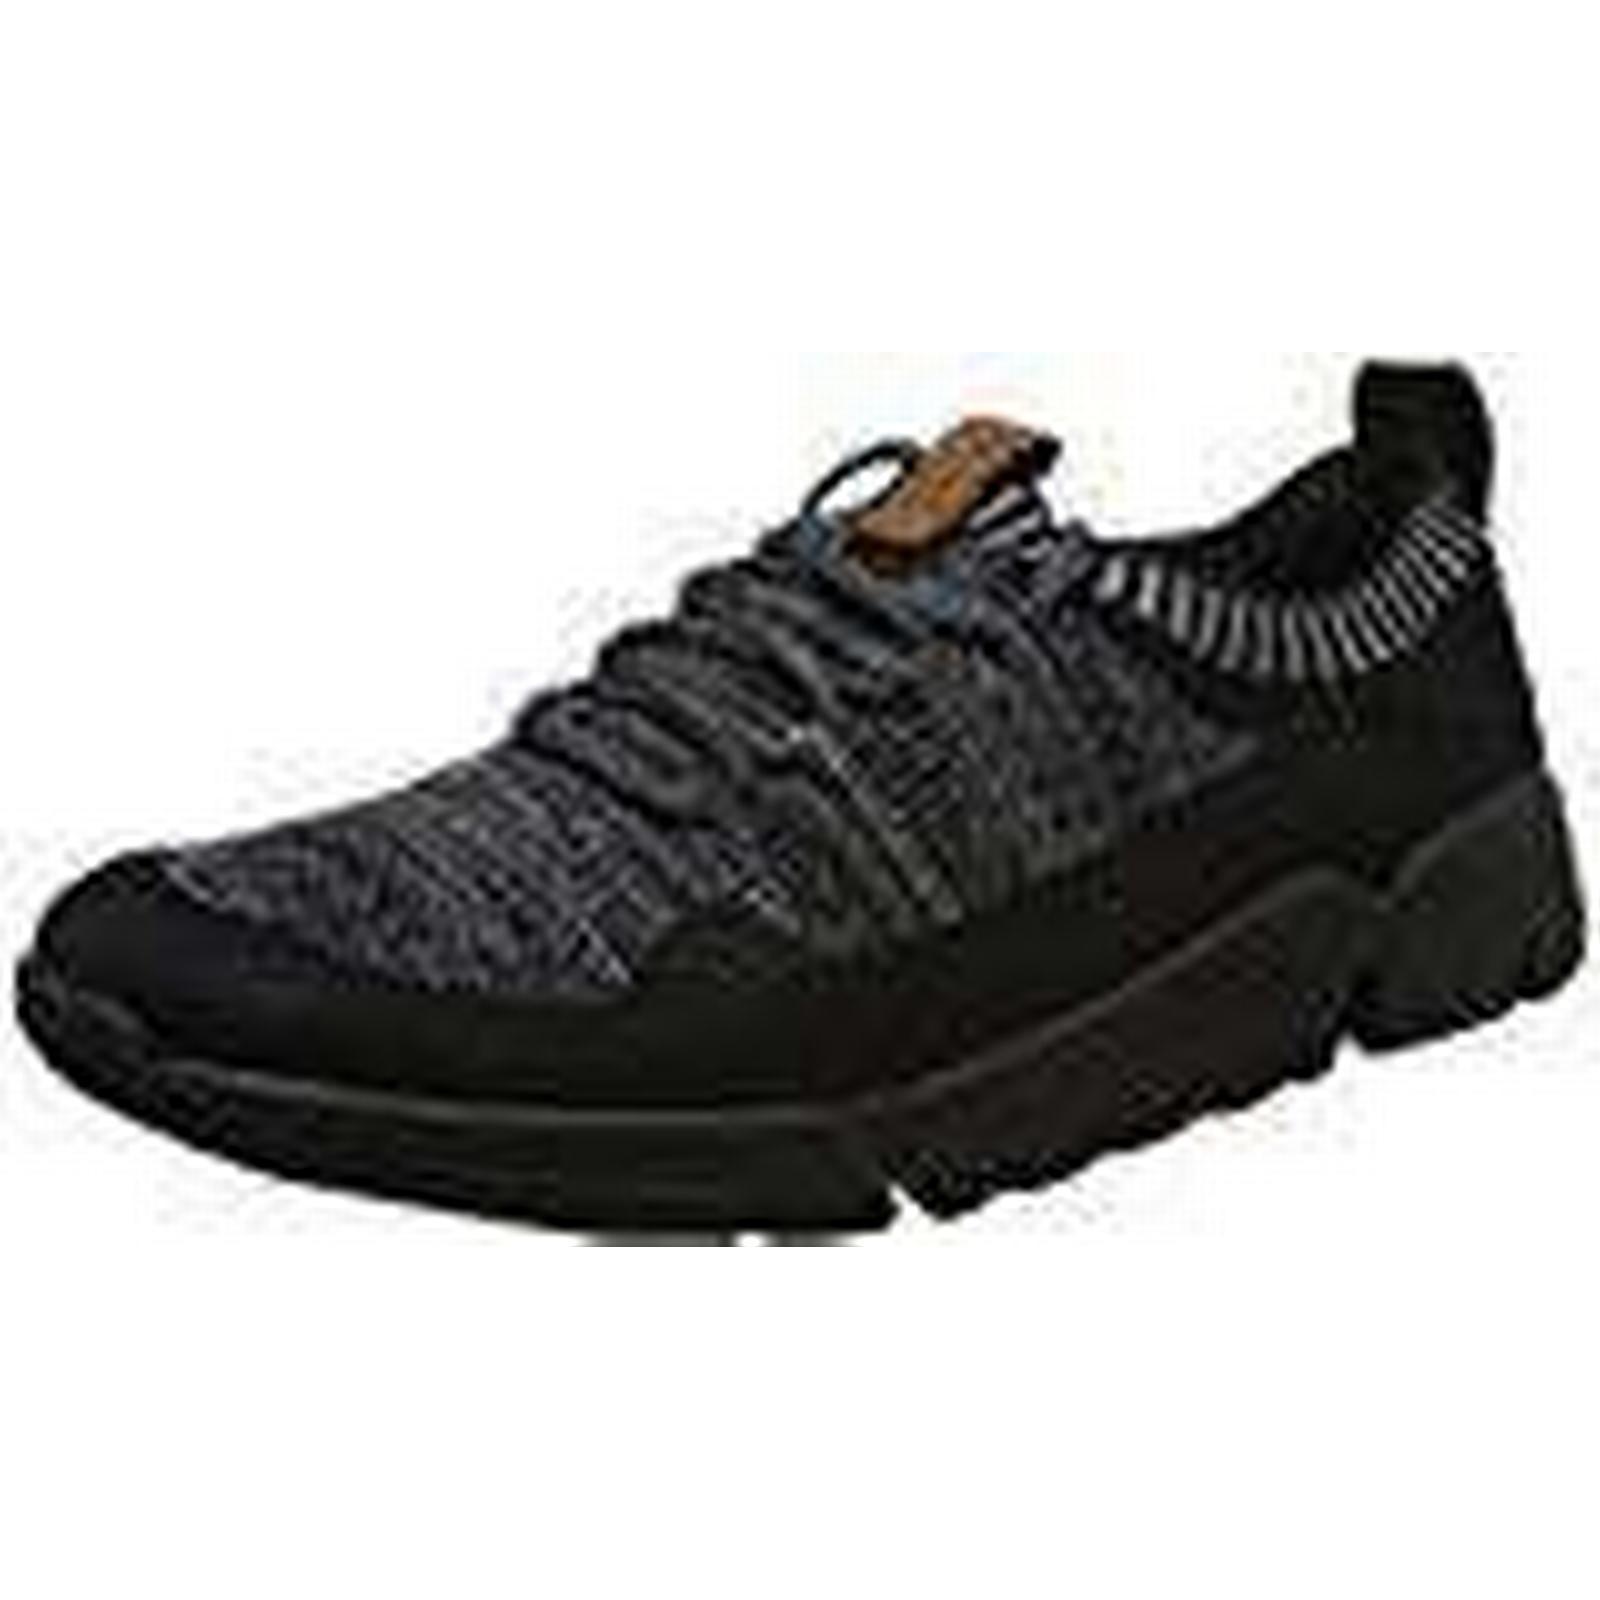 Clarks Men's Triactive Knit 10 Trainers, (Black Leather-), 10 UK 10 Knit UK 5c340a